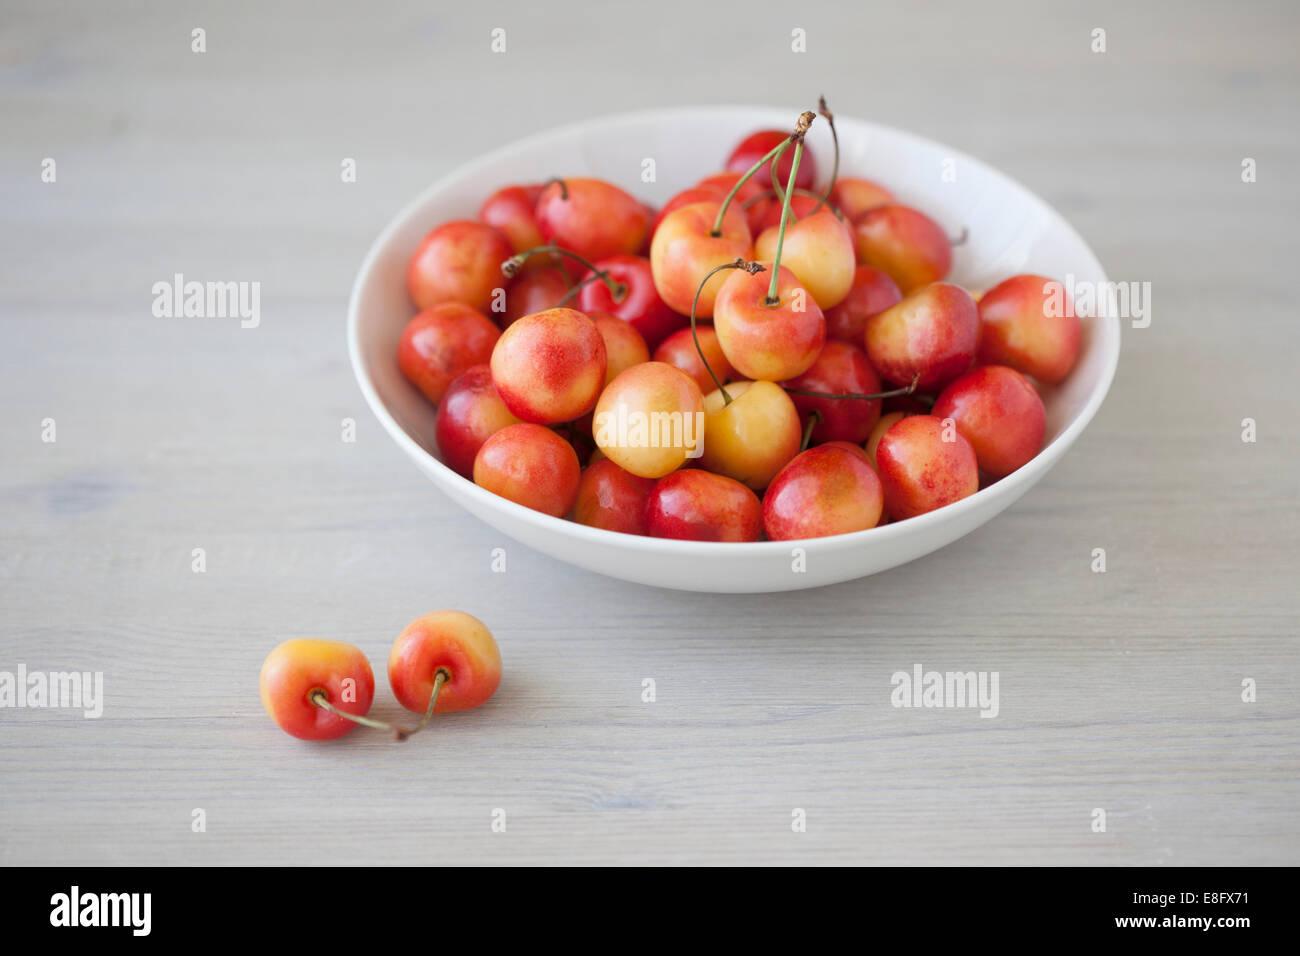 Bowl of cherries - Stock Image